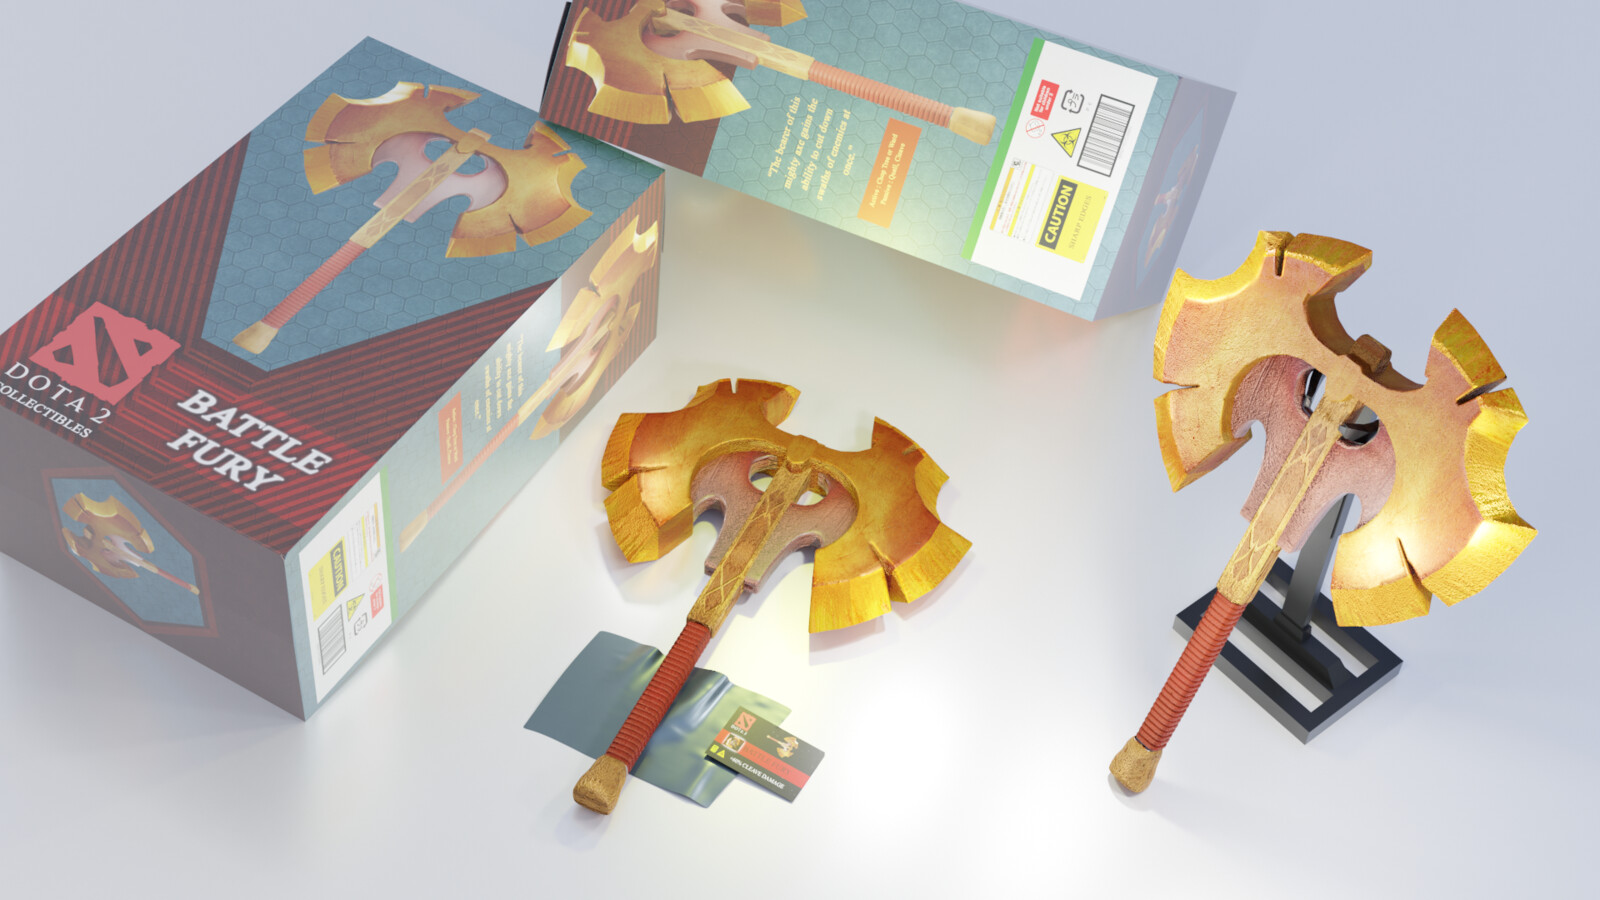 ArtStation - Battlefury (Dota 2 Figure), aseuraf x